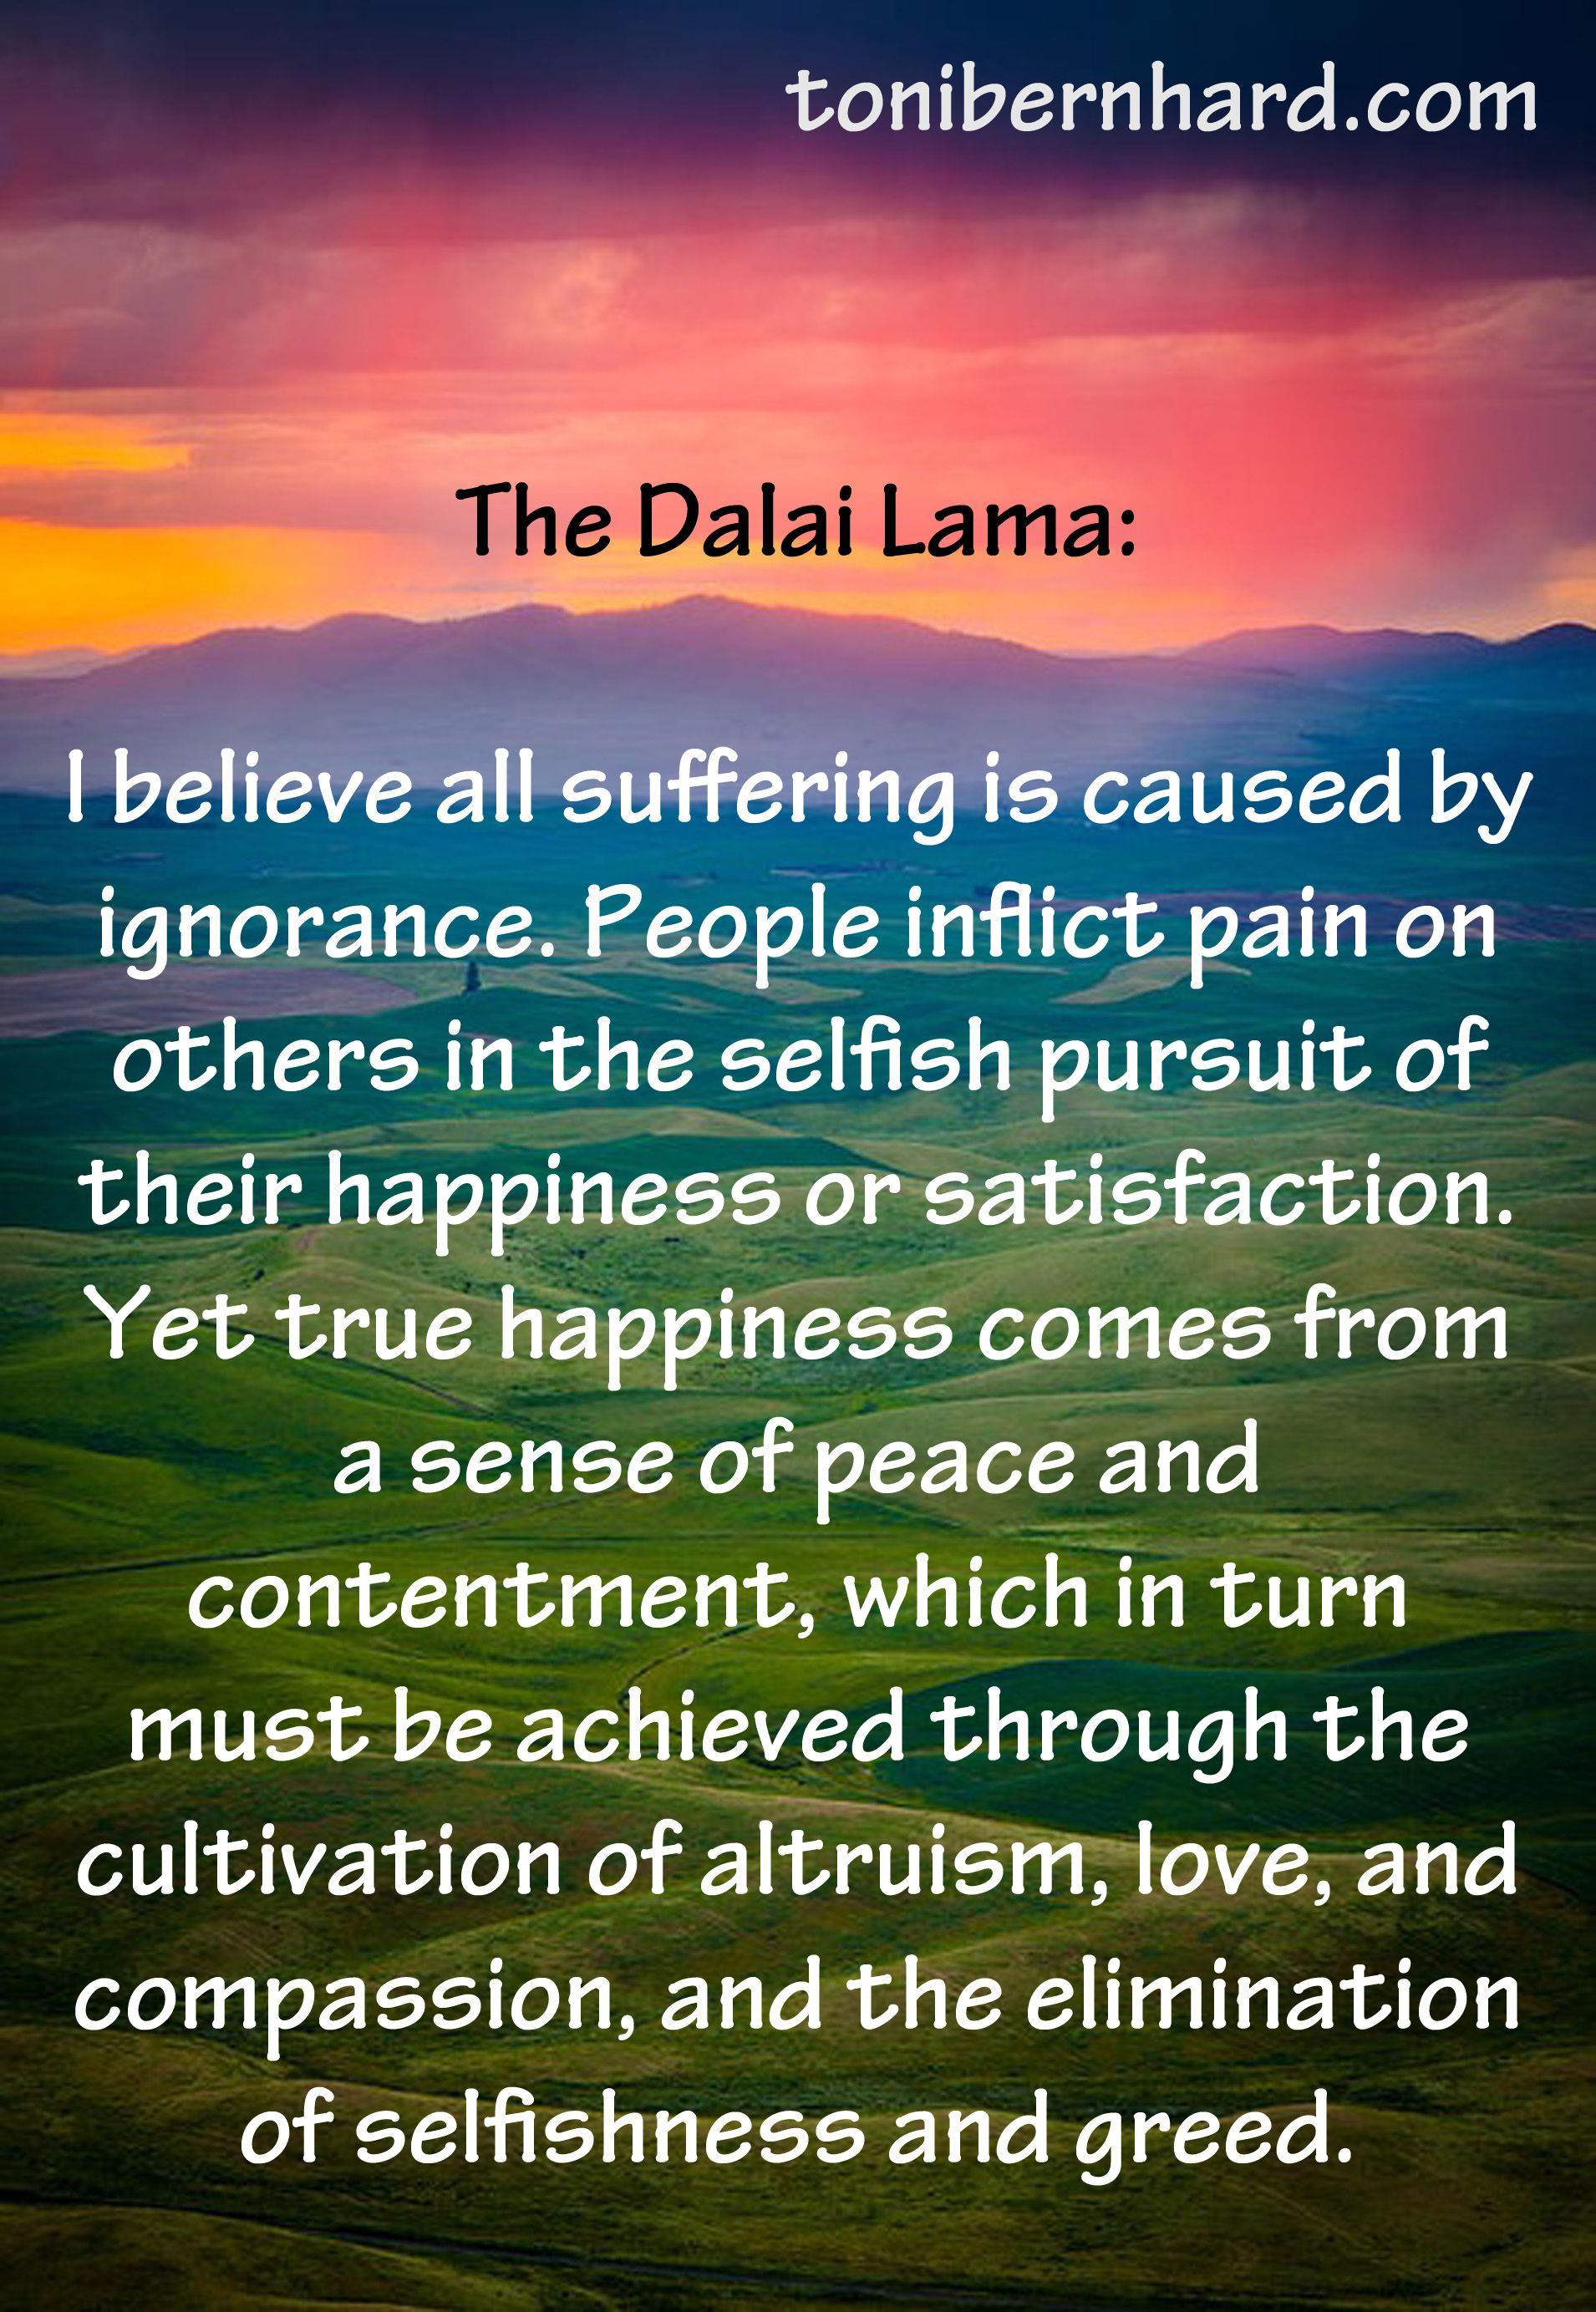 the dalai lama quotes pinterest